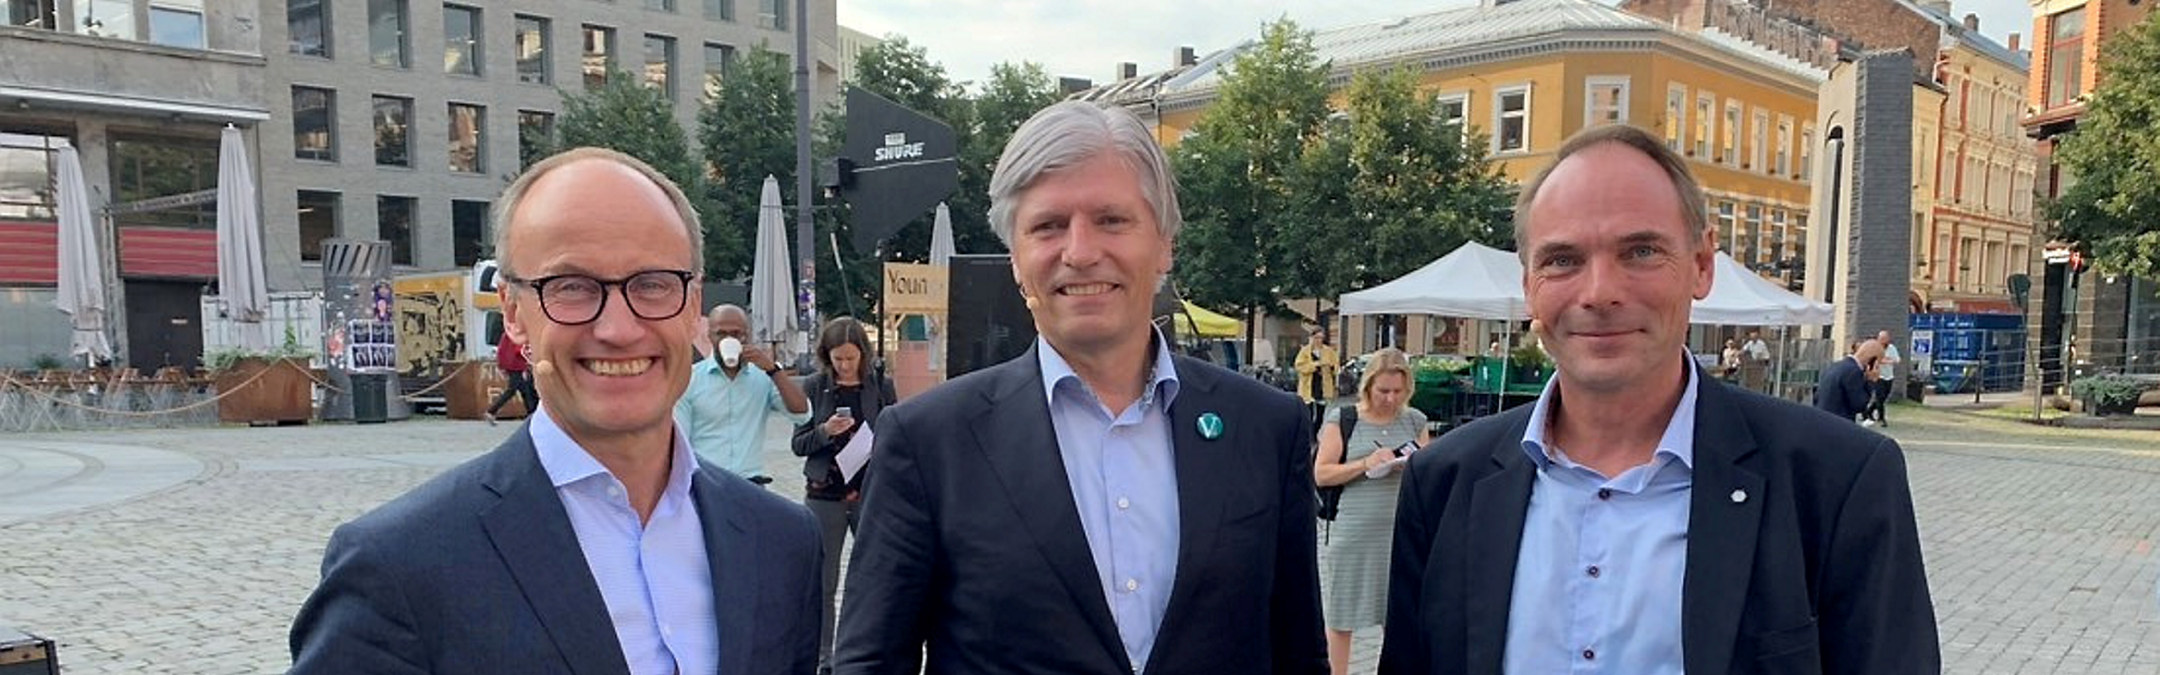 Direktør i Enova Nils Kristian Nakstad, Klima- og miljøminister Ola Elvestuen (V) og adm.dir i NBF Stig Morten Nilsen.